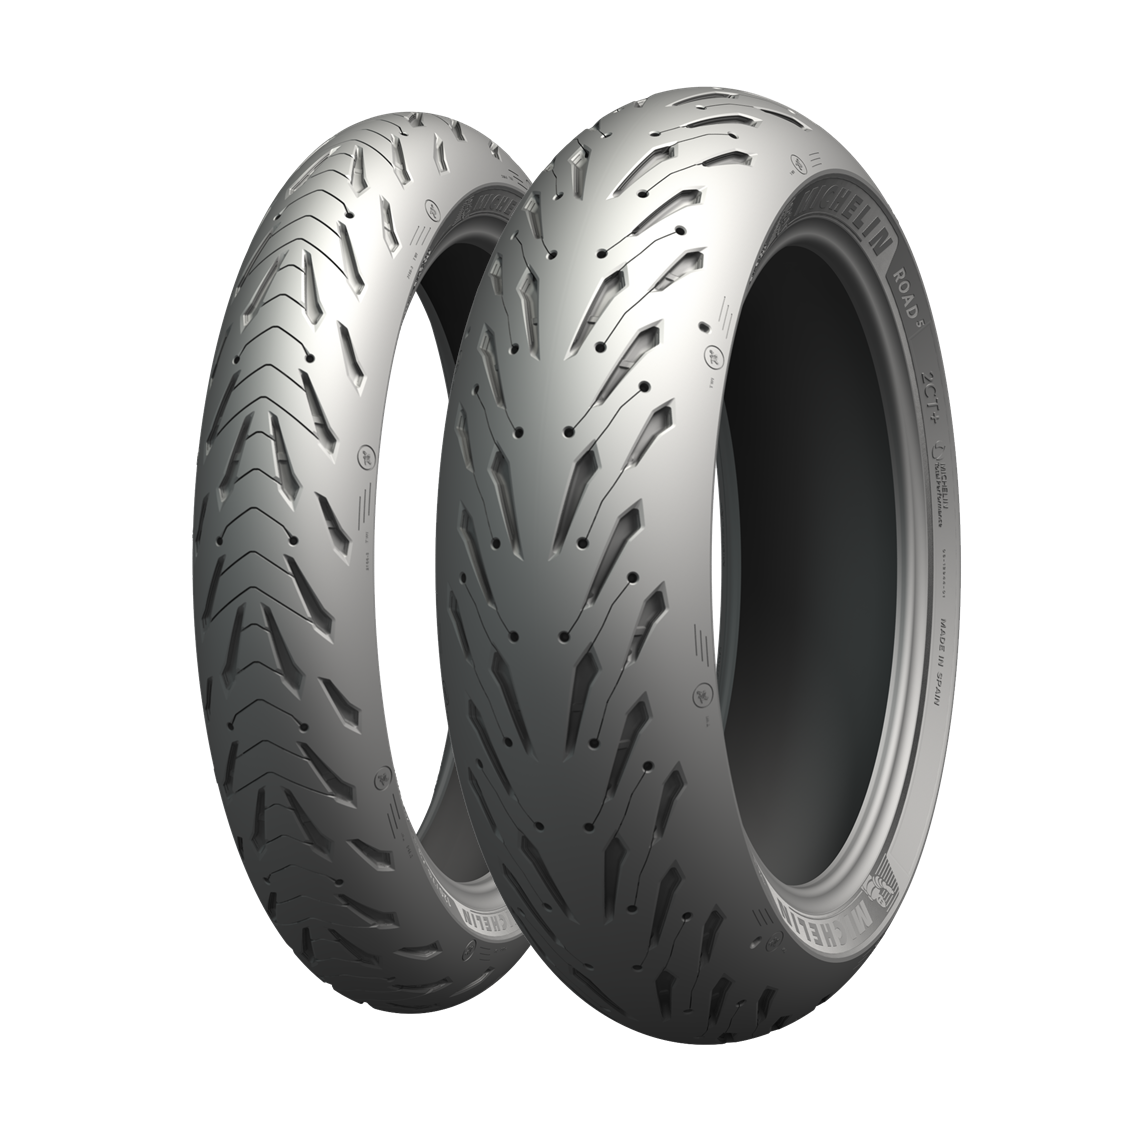 michelin road 5 nouveau pneu moto 2018 chewing gomme. Black Bedroom Furniture Sets. Home Design Ideas